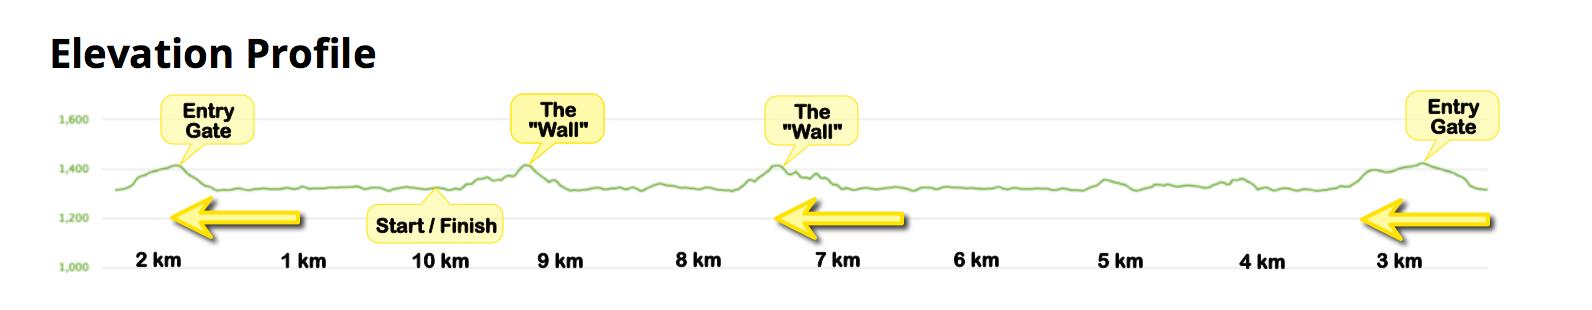 10K Race Elevation Profile